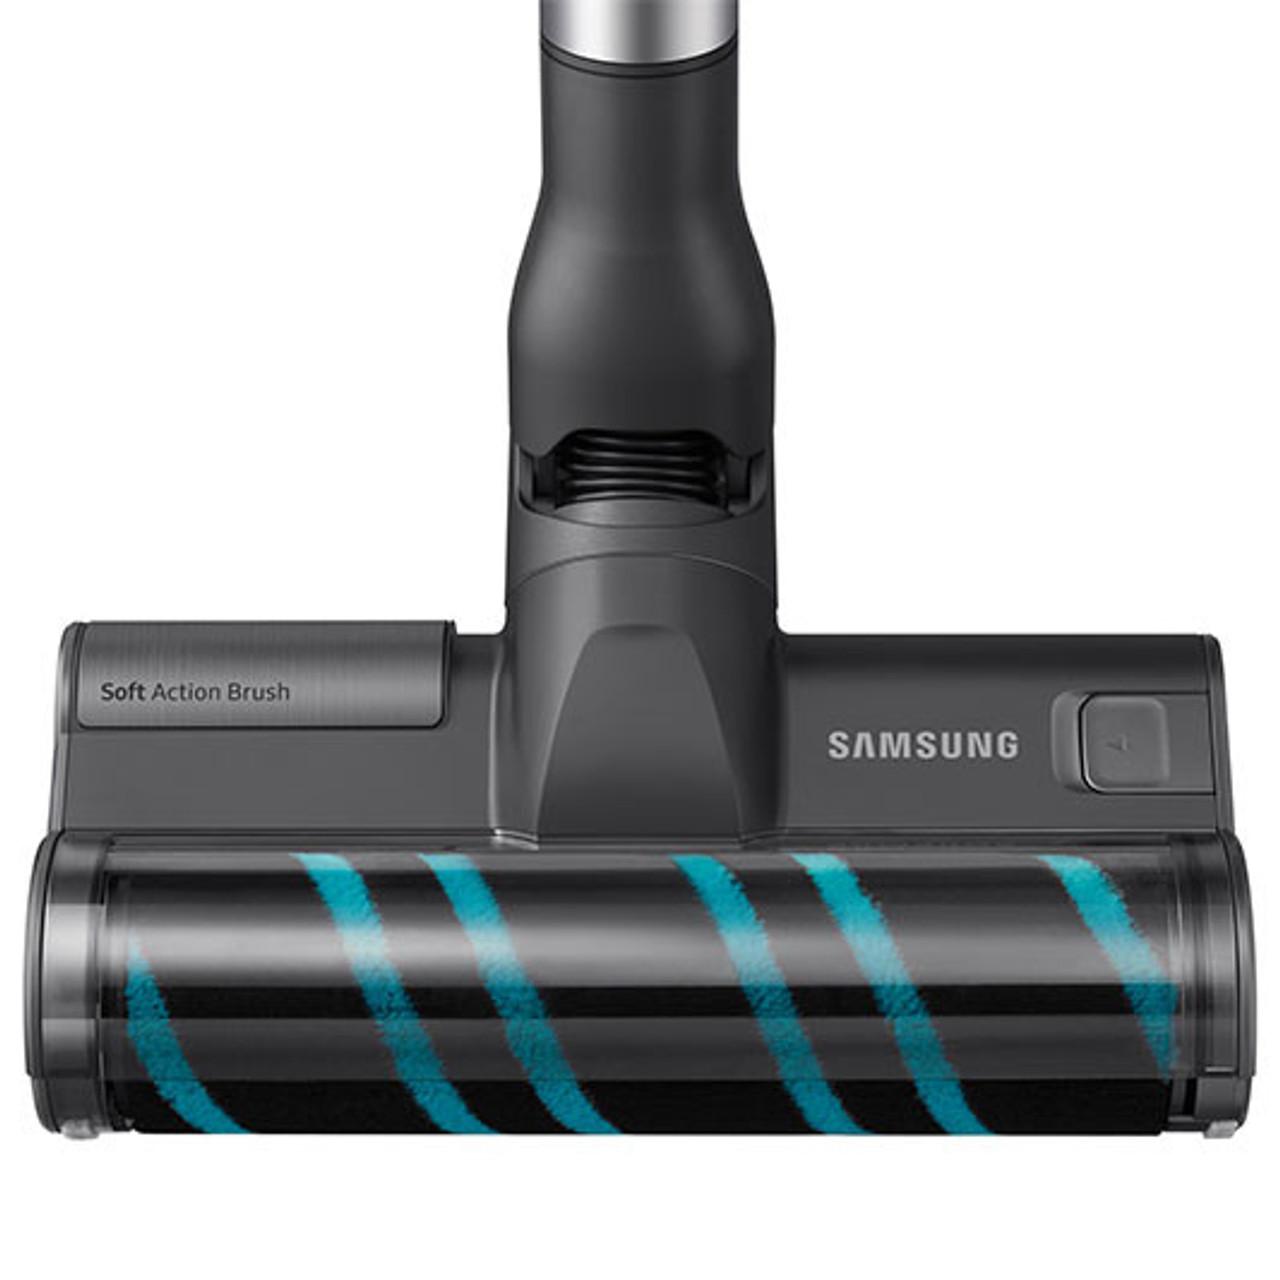 Samsung VS20R9046T Jet 90 Complete Stick Vacuum Cleaner